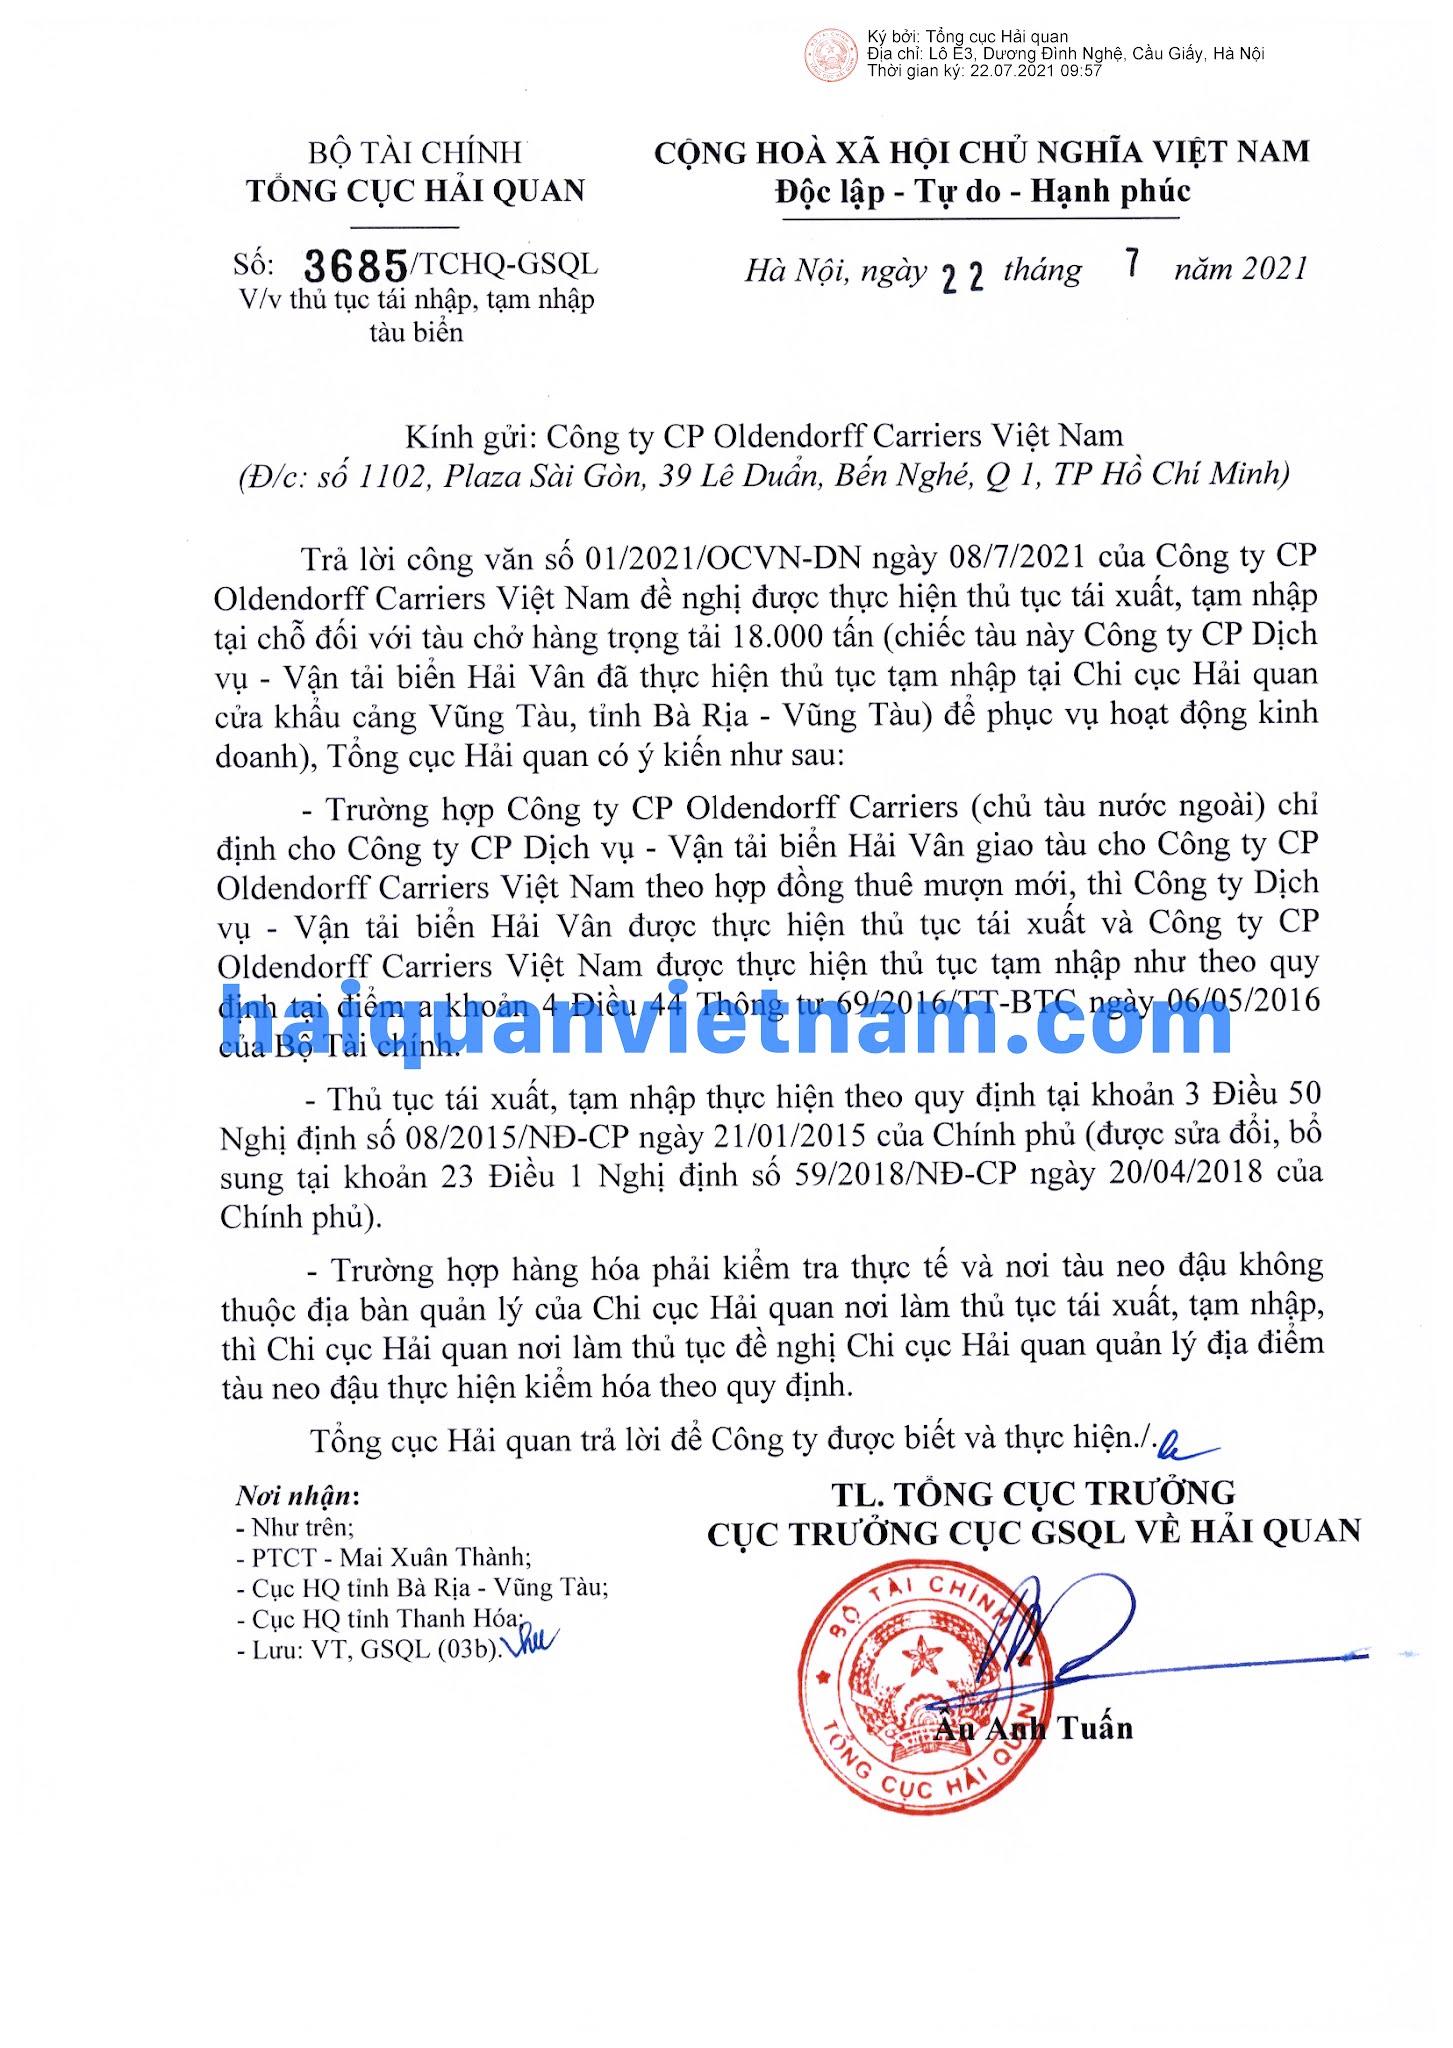 [Image: 210722%2B-%2B3685-TCHQ-GSQL_haiquanvietnam_01.jpg]